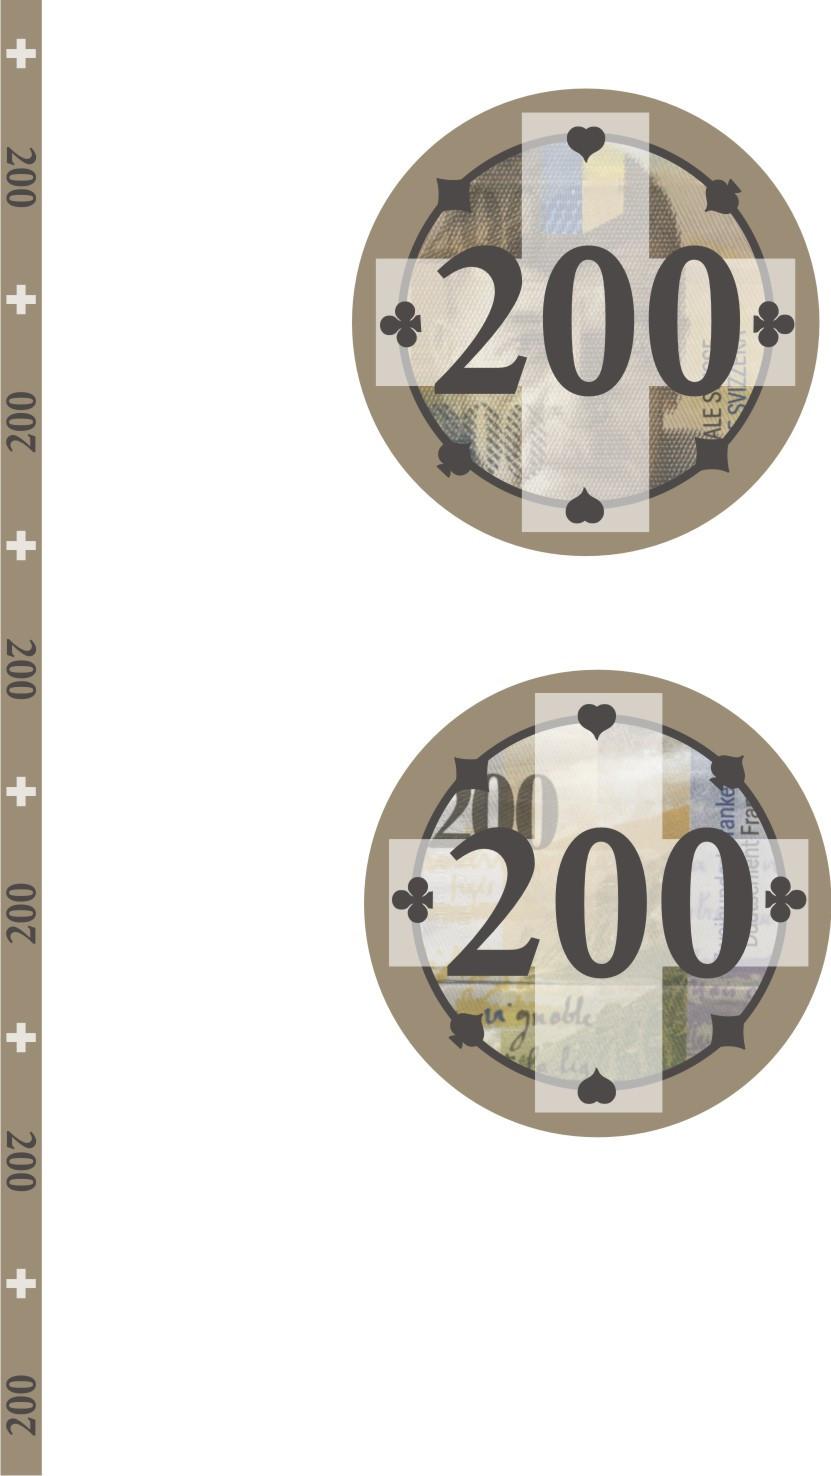 Swiss Edition Ceramic Chips Fr. 200.00